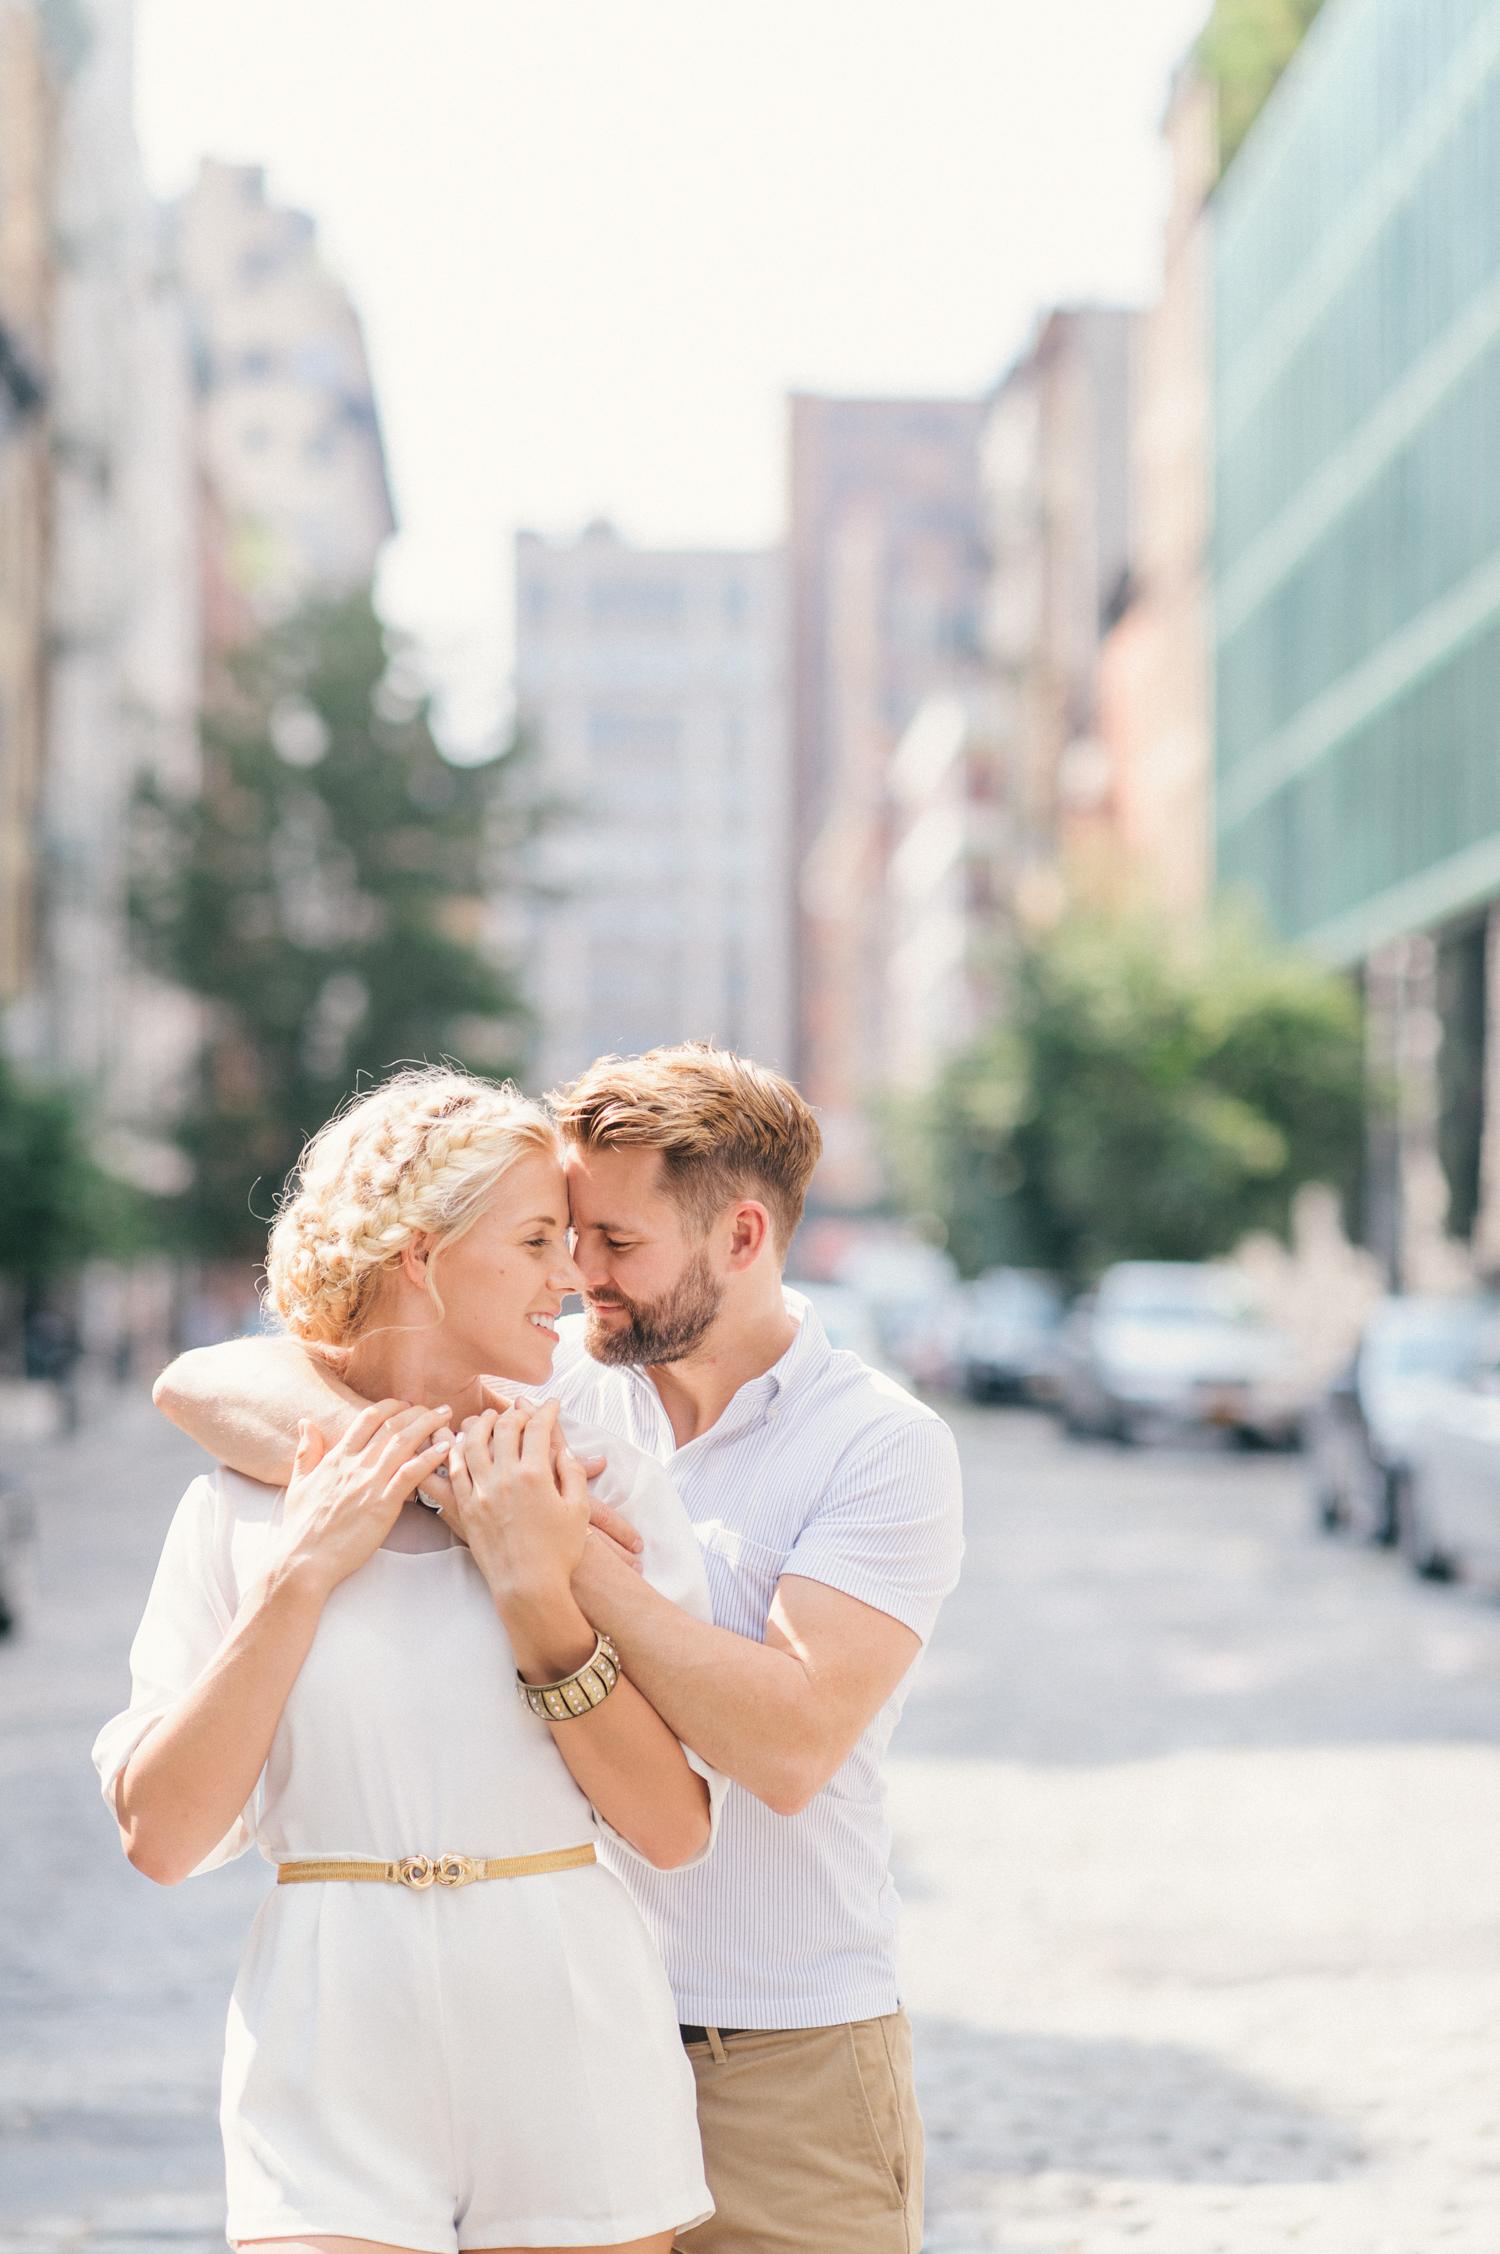 SoHoManhattan.Engagements.NYC4.jpg